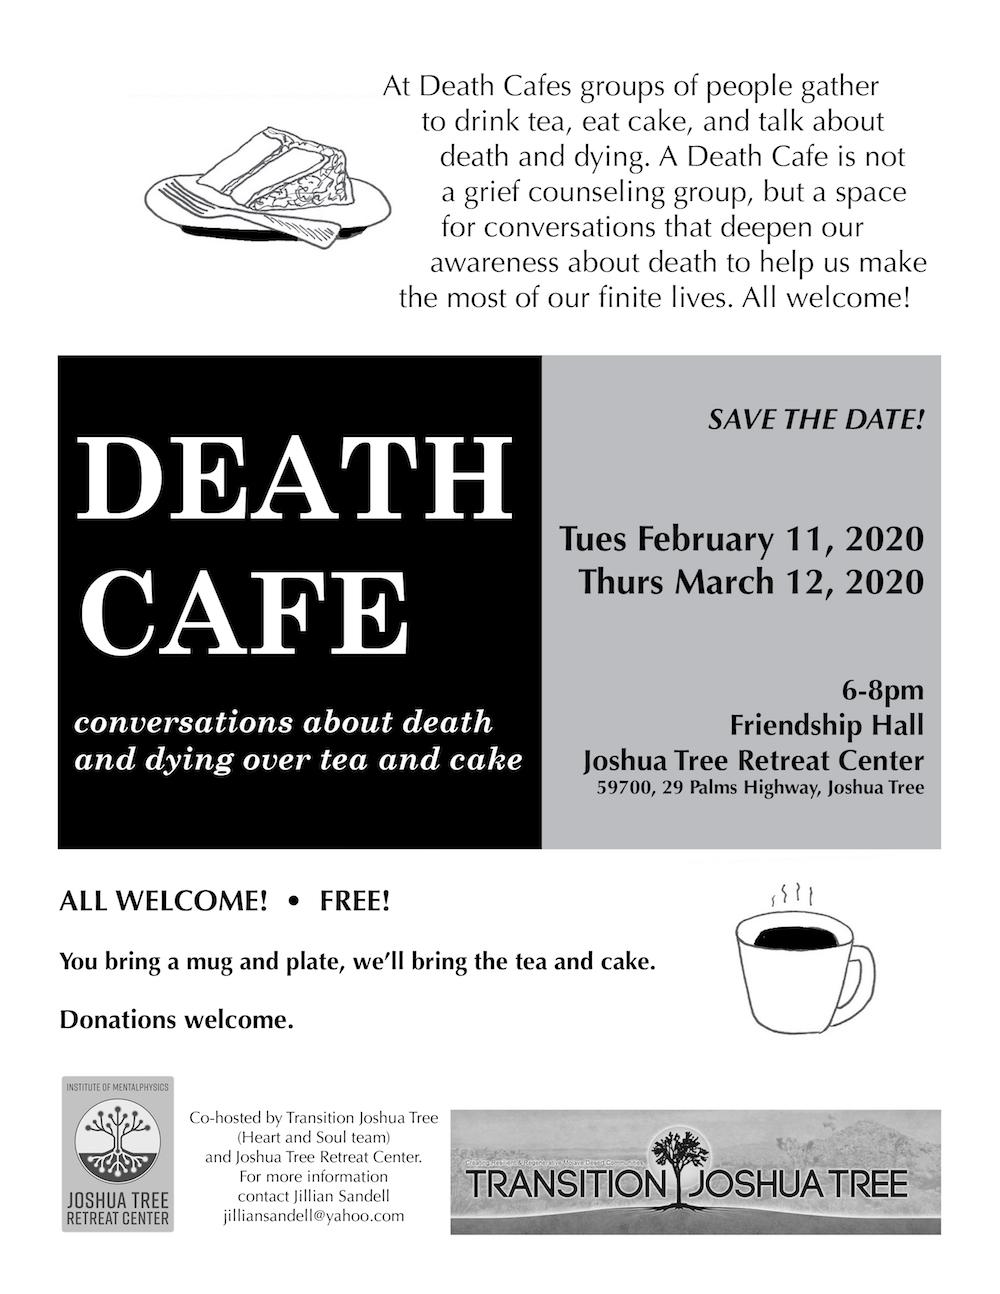 Death-Cafe-flyer-FINAL-Feb-March-2020-resized